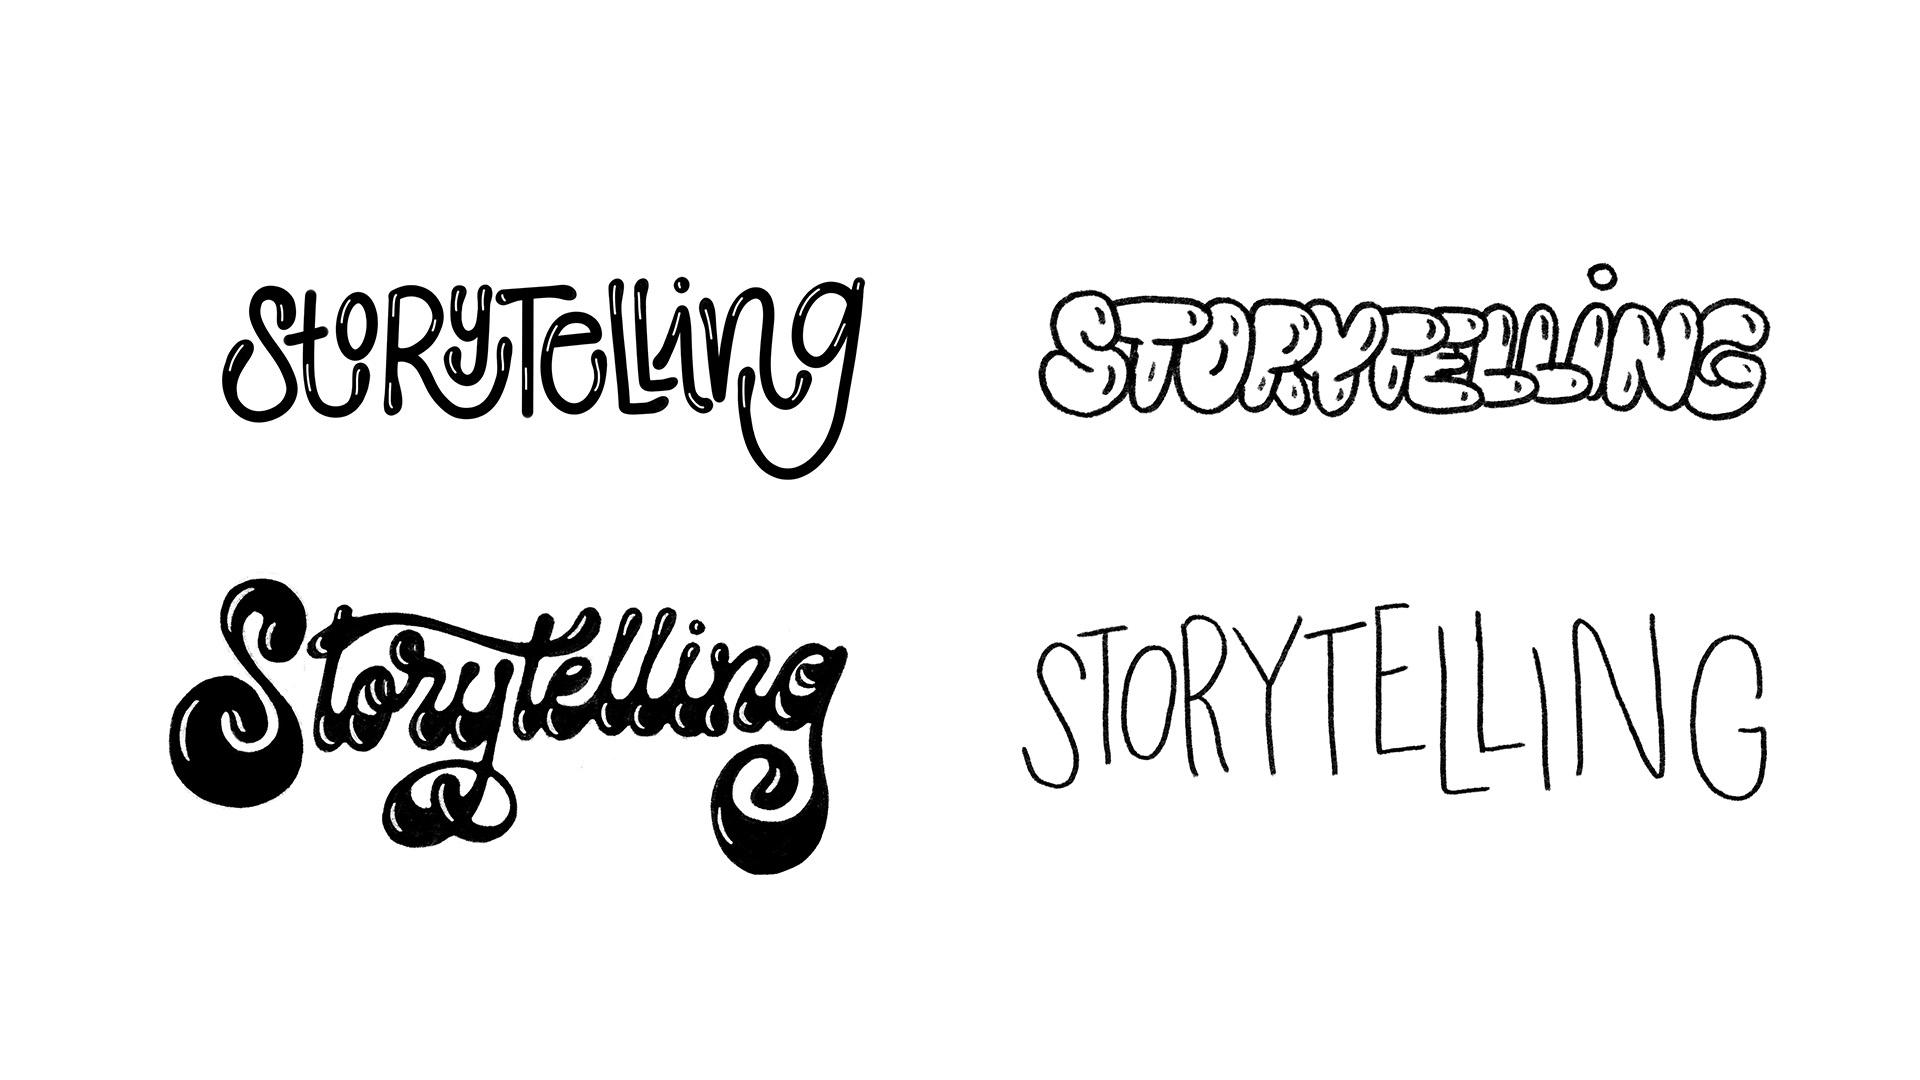 roofstudio_juni-learning_storytelling-02-2